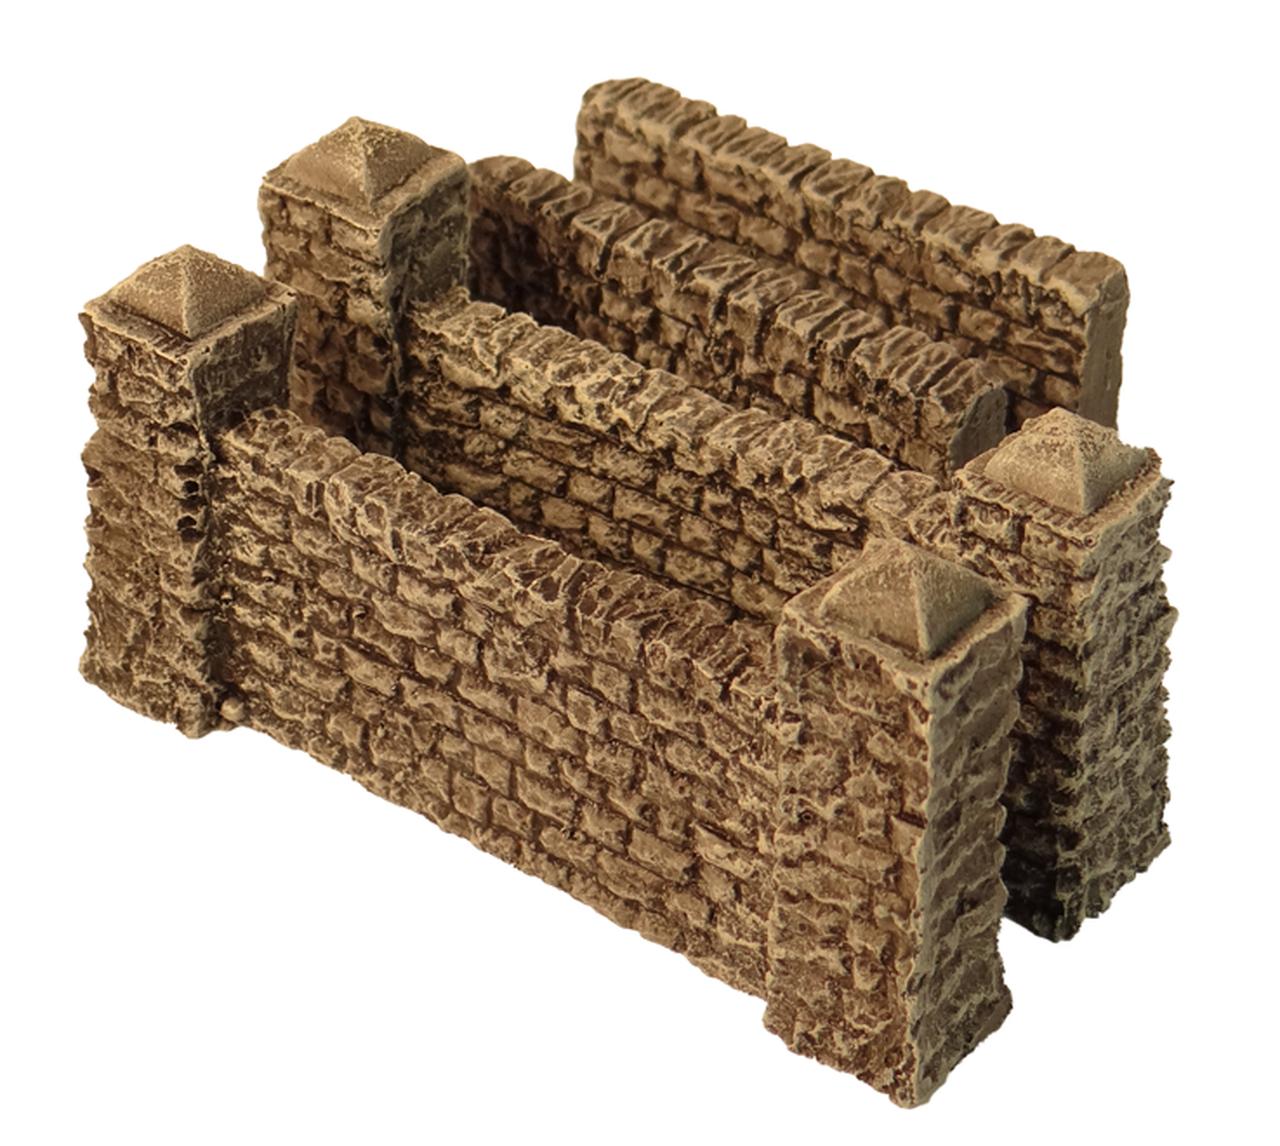 Novus Design: Small Stone Walls (6)